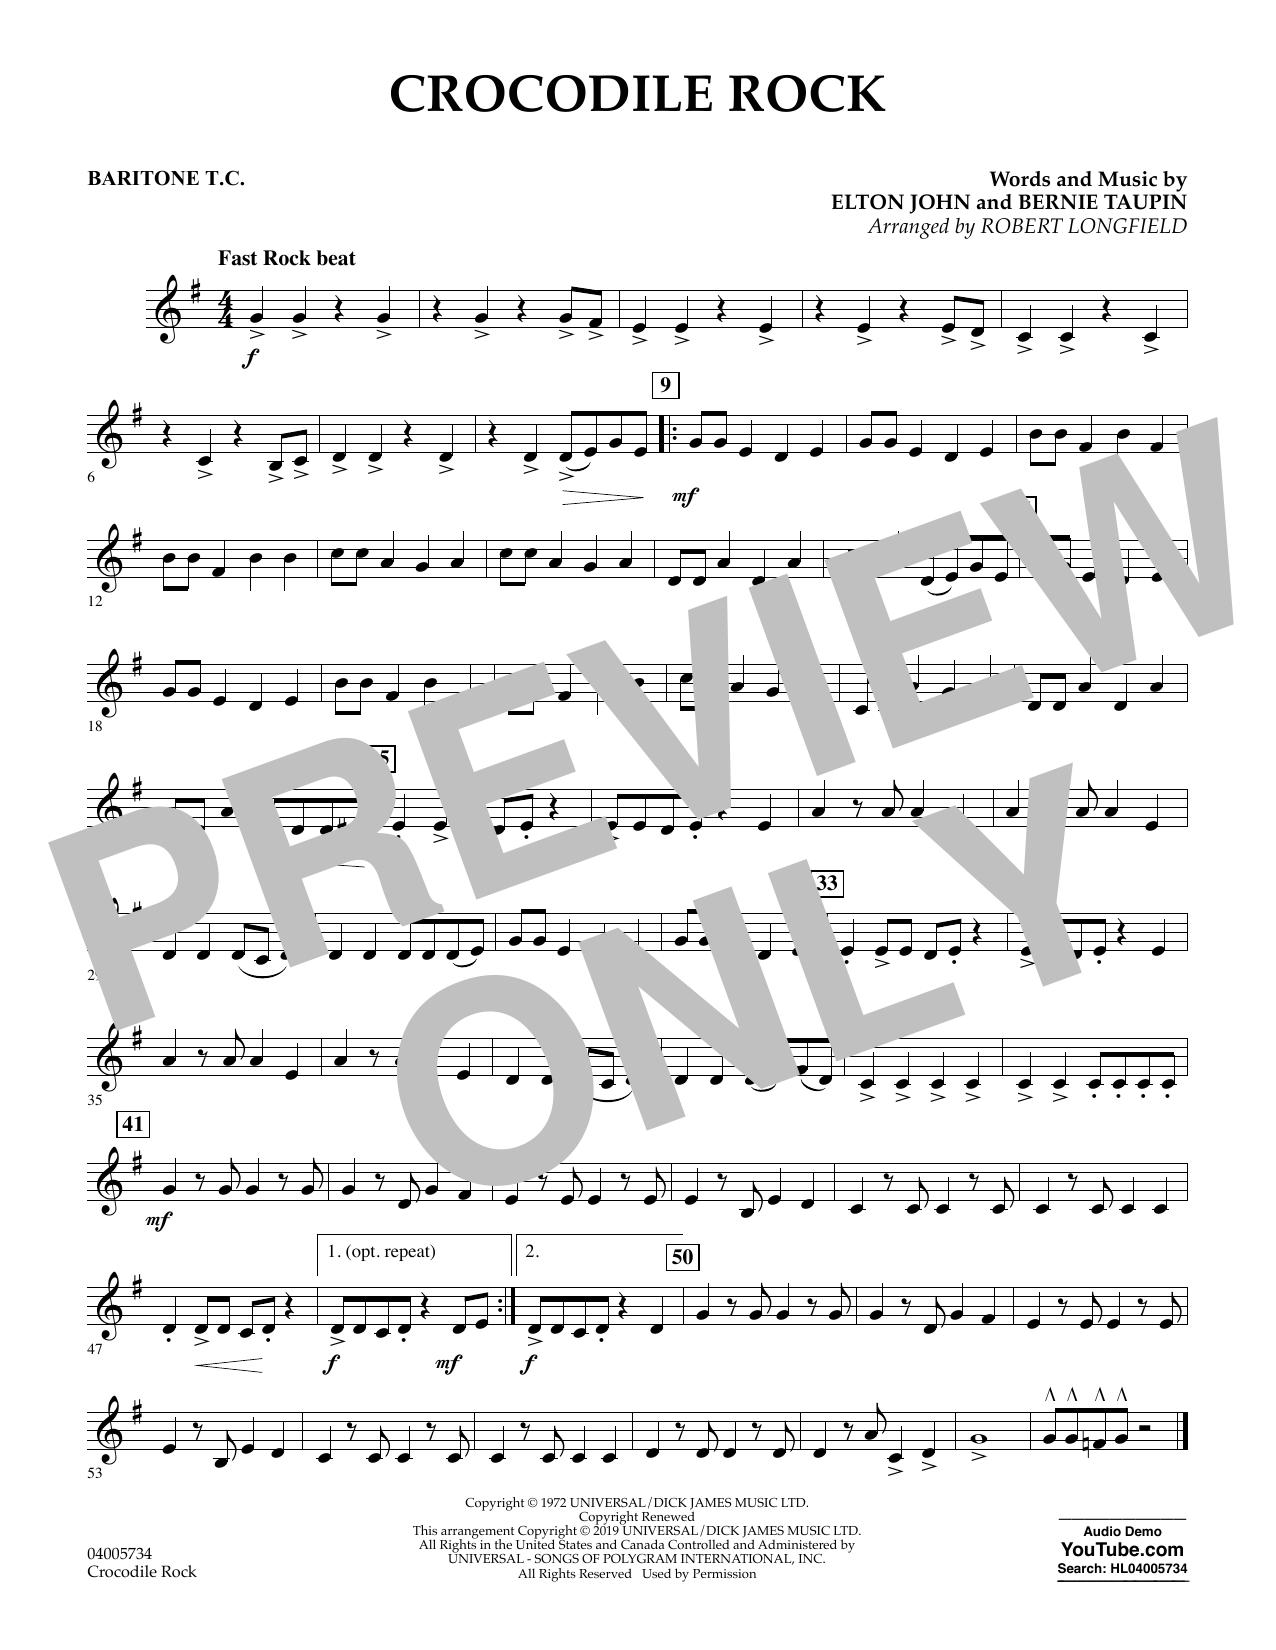 Crocodile Rock (arr. Robert Longfield) - Baritone T.C. (Concert Band)